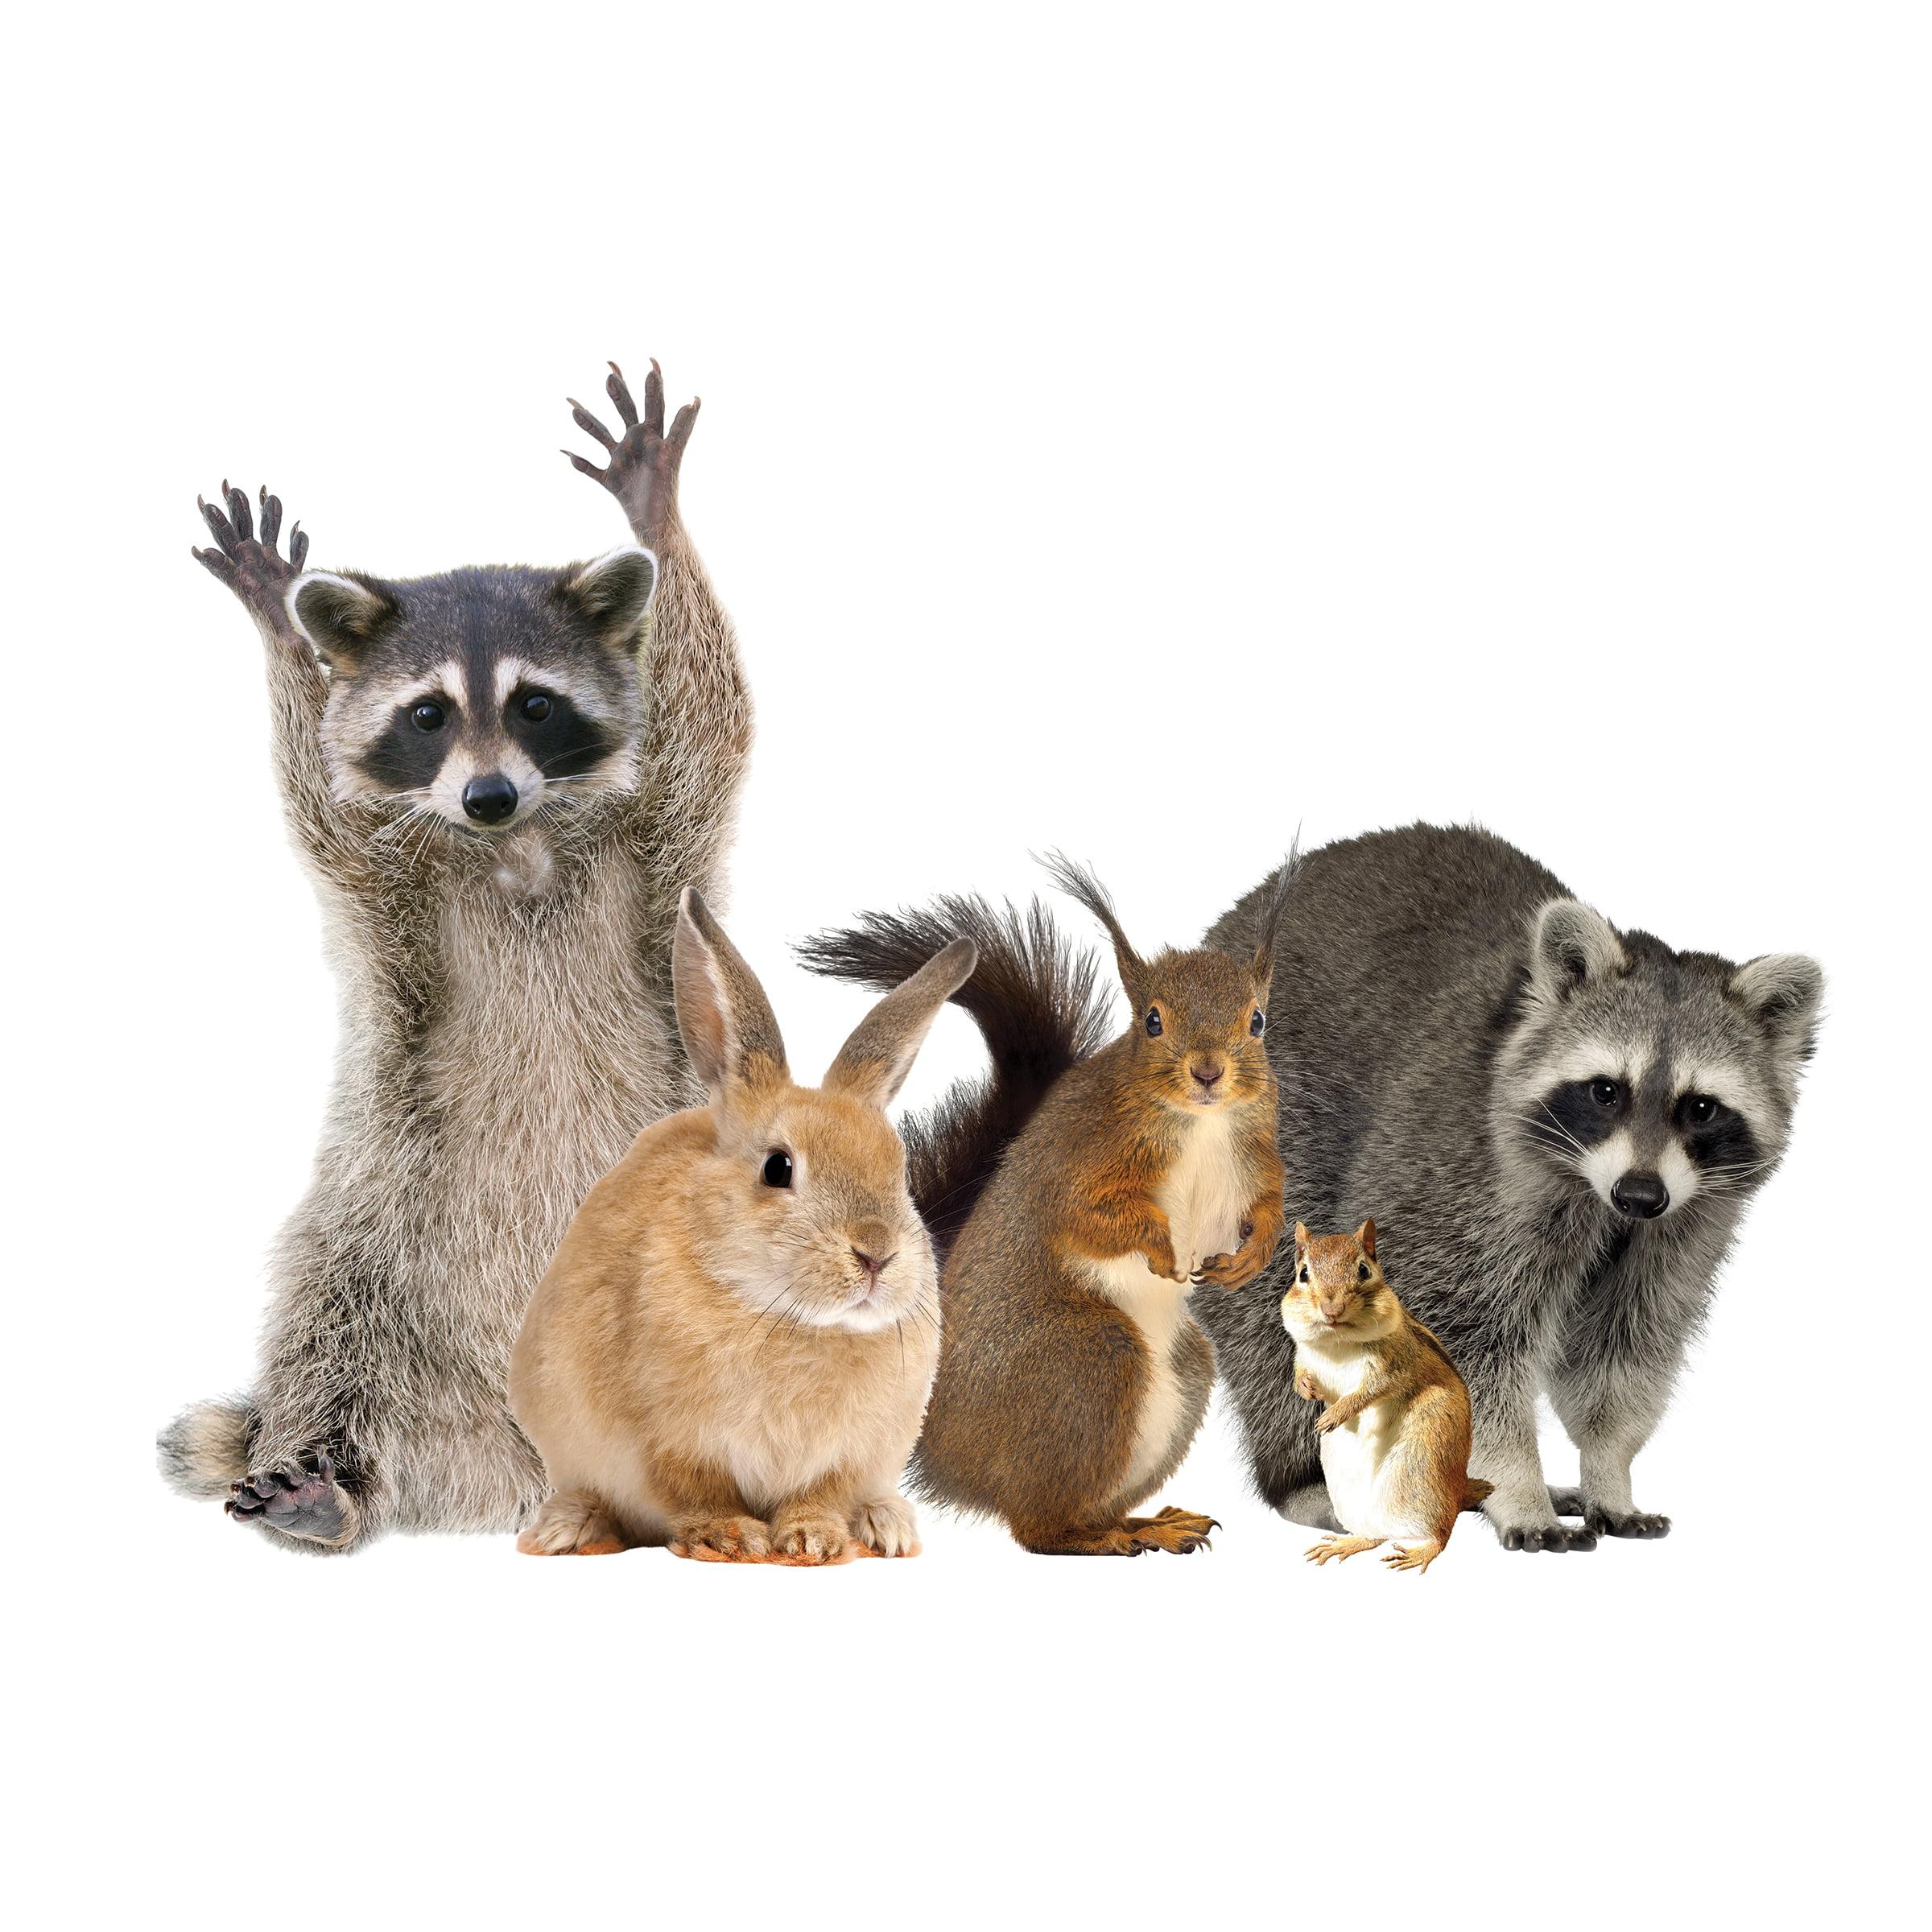 Woodland Animals Window Decal Cling - Raccoon & Friends Vinyl Sticker